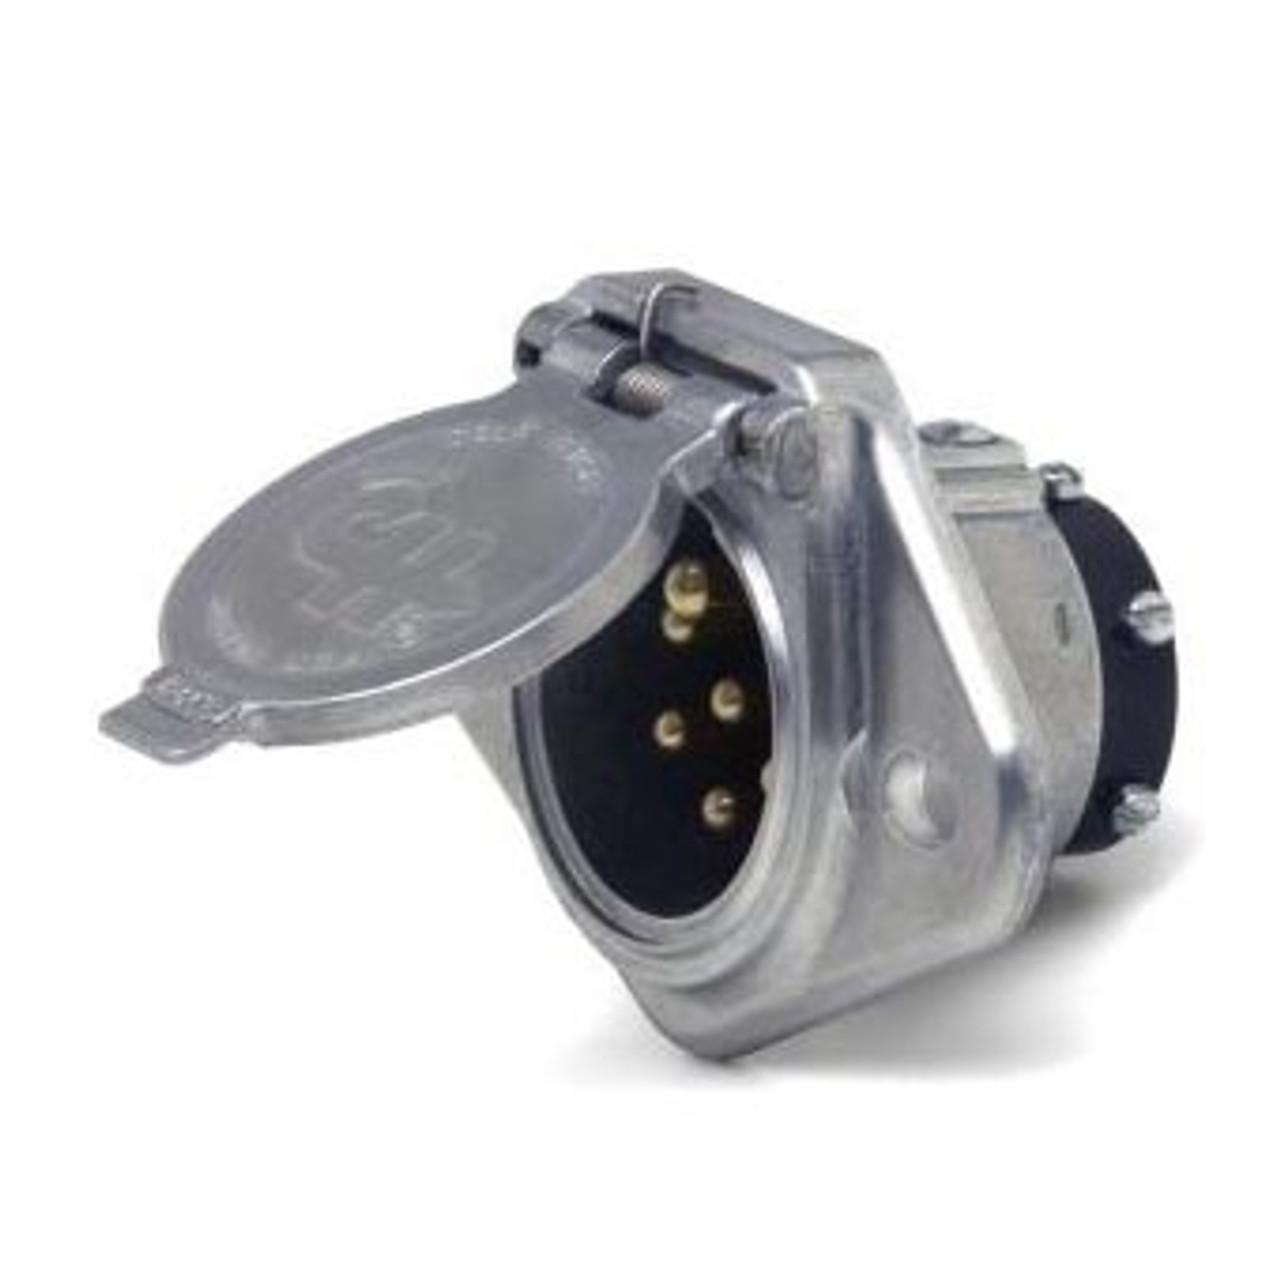 TRLR CONNECT 7POLE SOCKET SELF GROUNDING SPLIT PINS